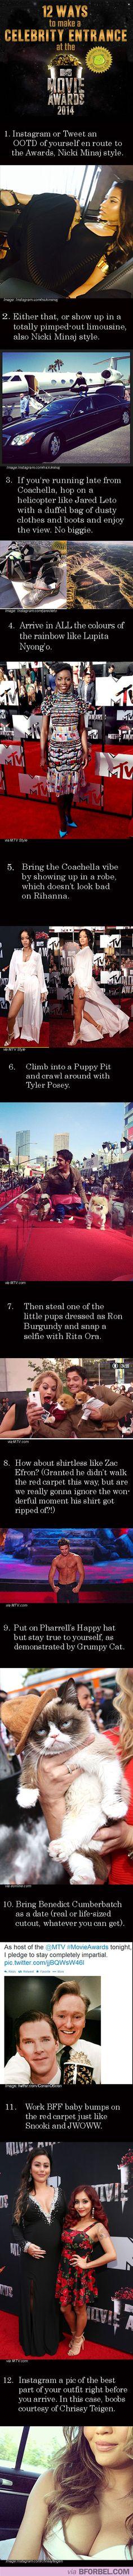 12 Ways To Make A Celebrity Entrance At The MTV Movie Awards 2014…